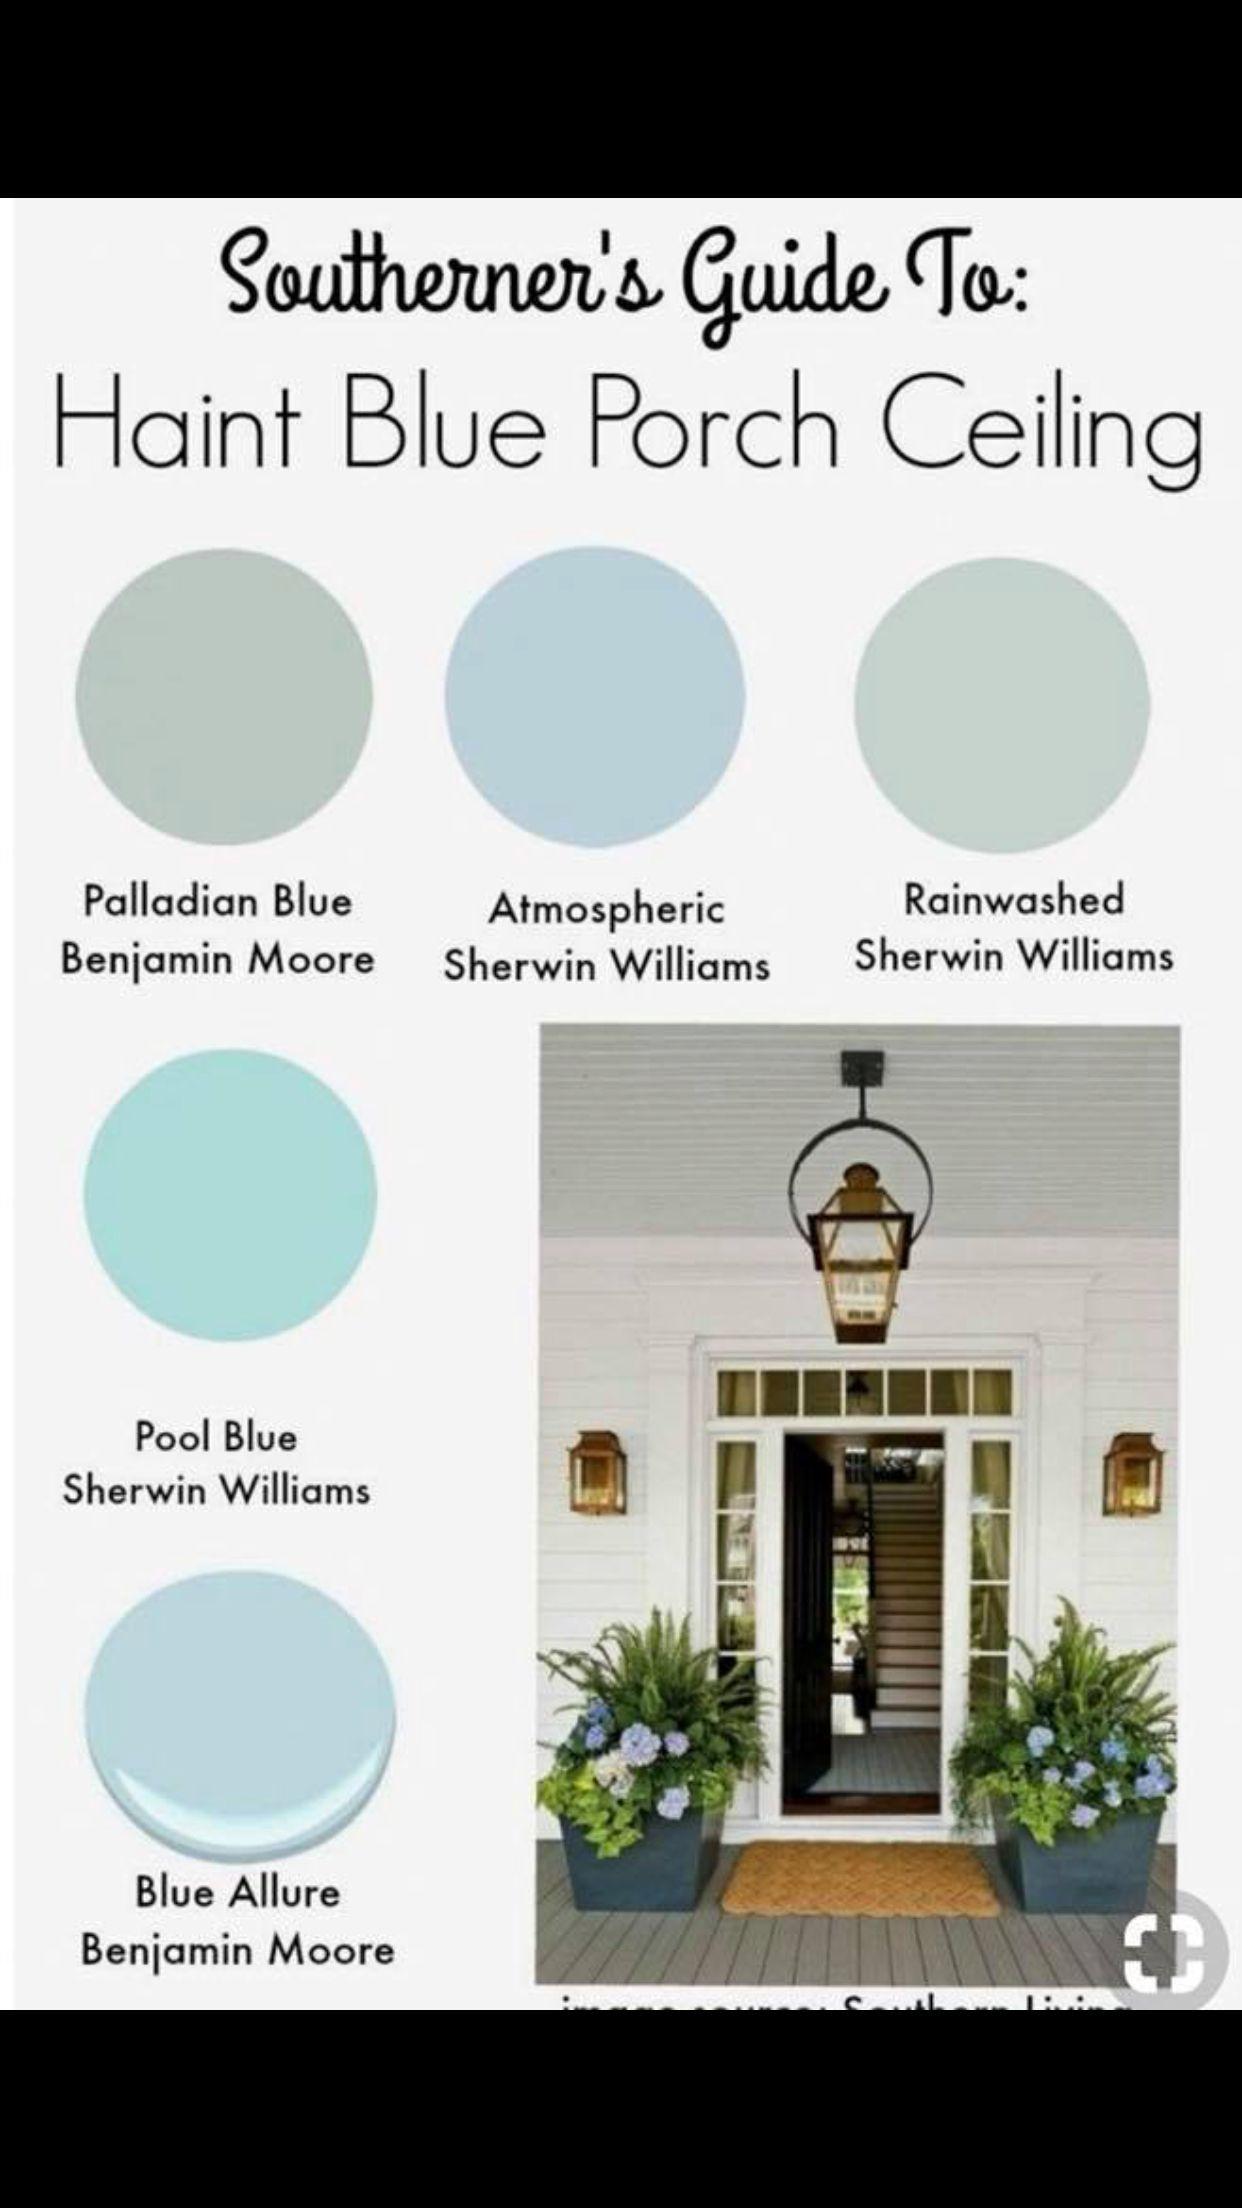 Pin By Gordana Goga Tudor On Flower Blue Porch Ceiling Haint